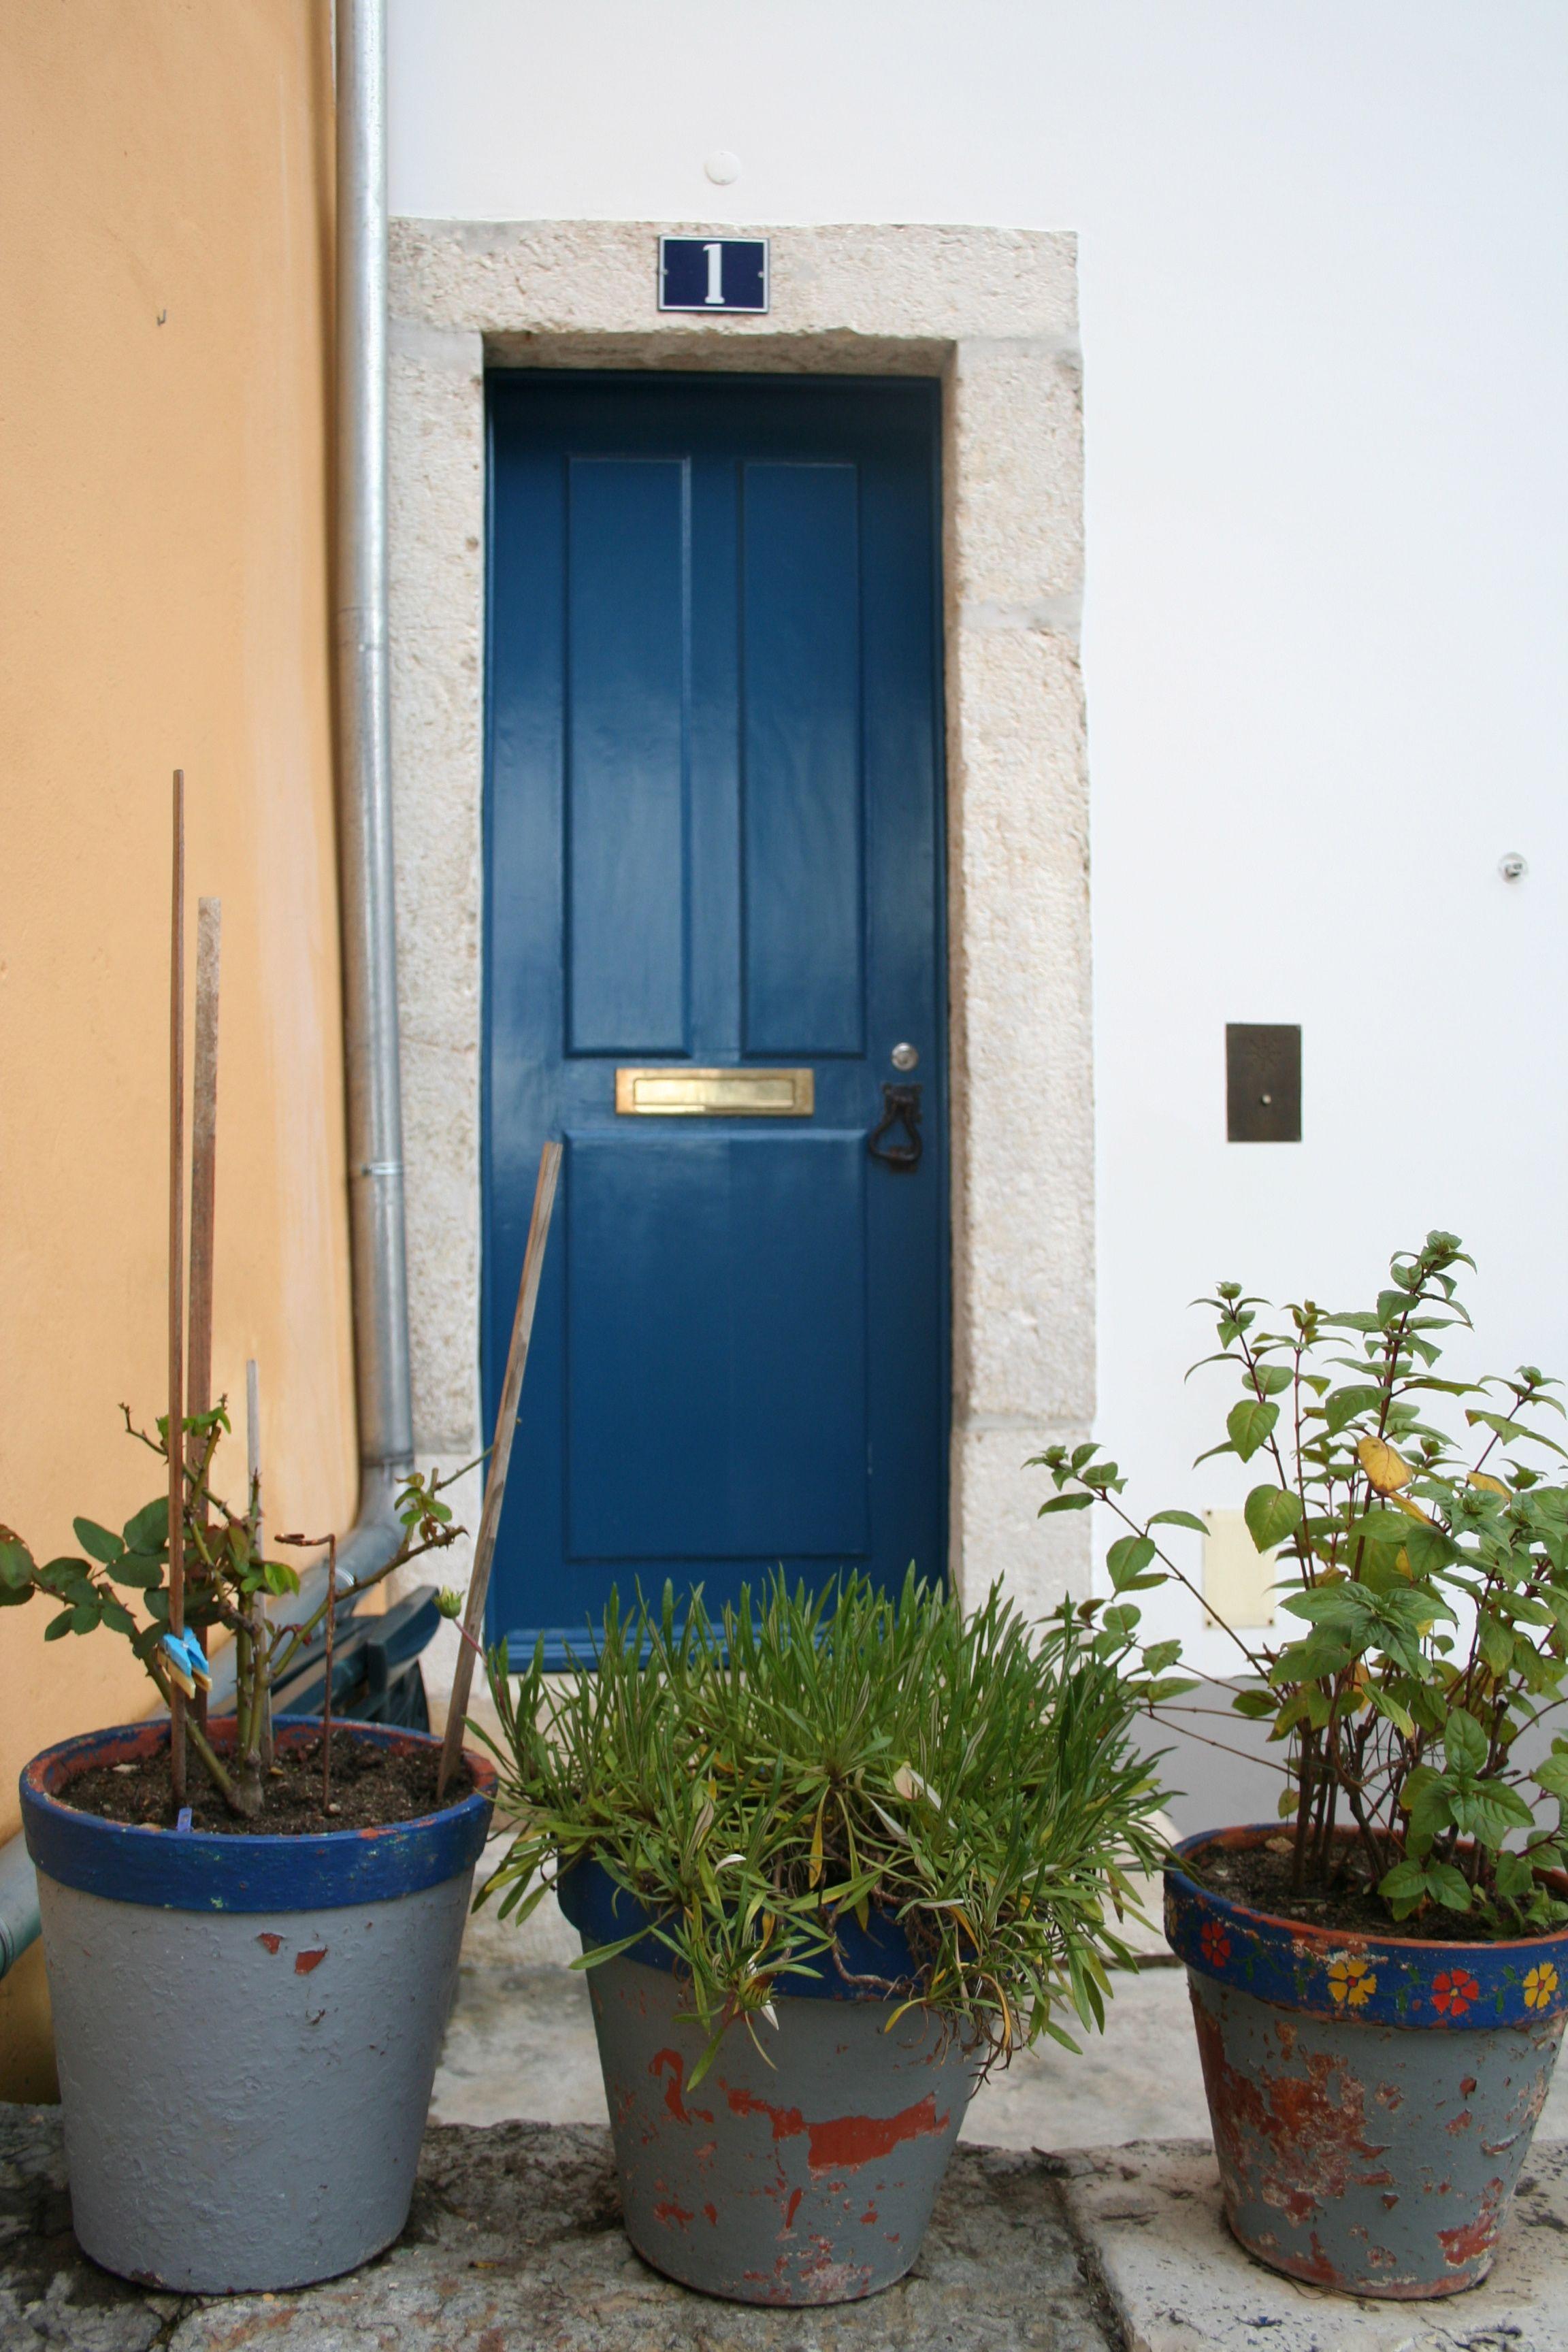 Lisboa, oud, blauw, deur, planten, entree - Blauw | Pinterest ...